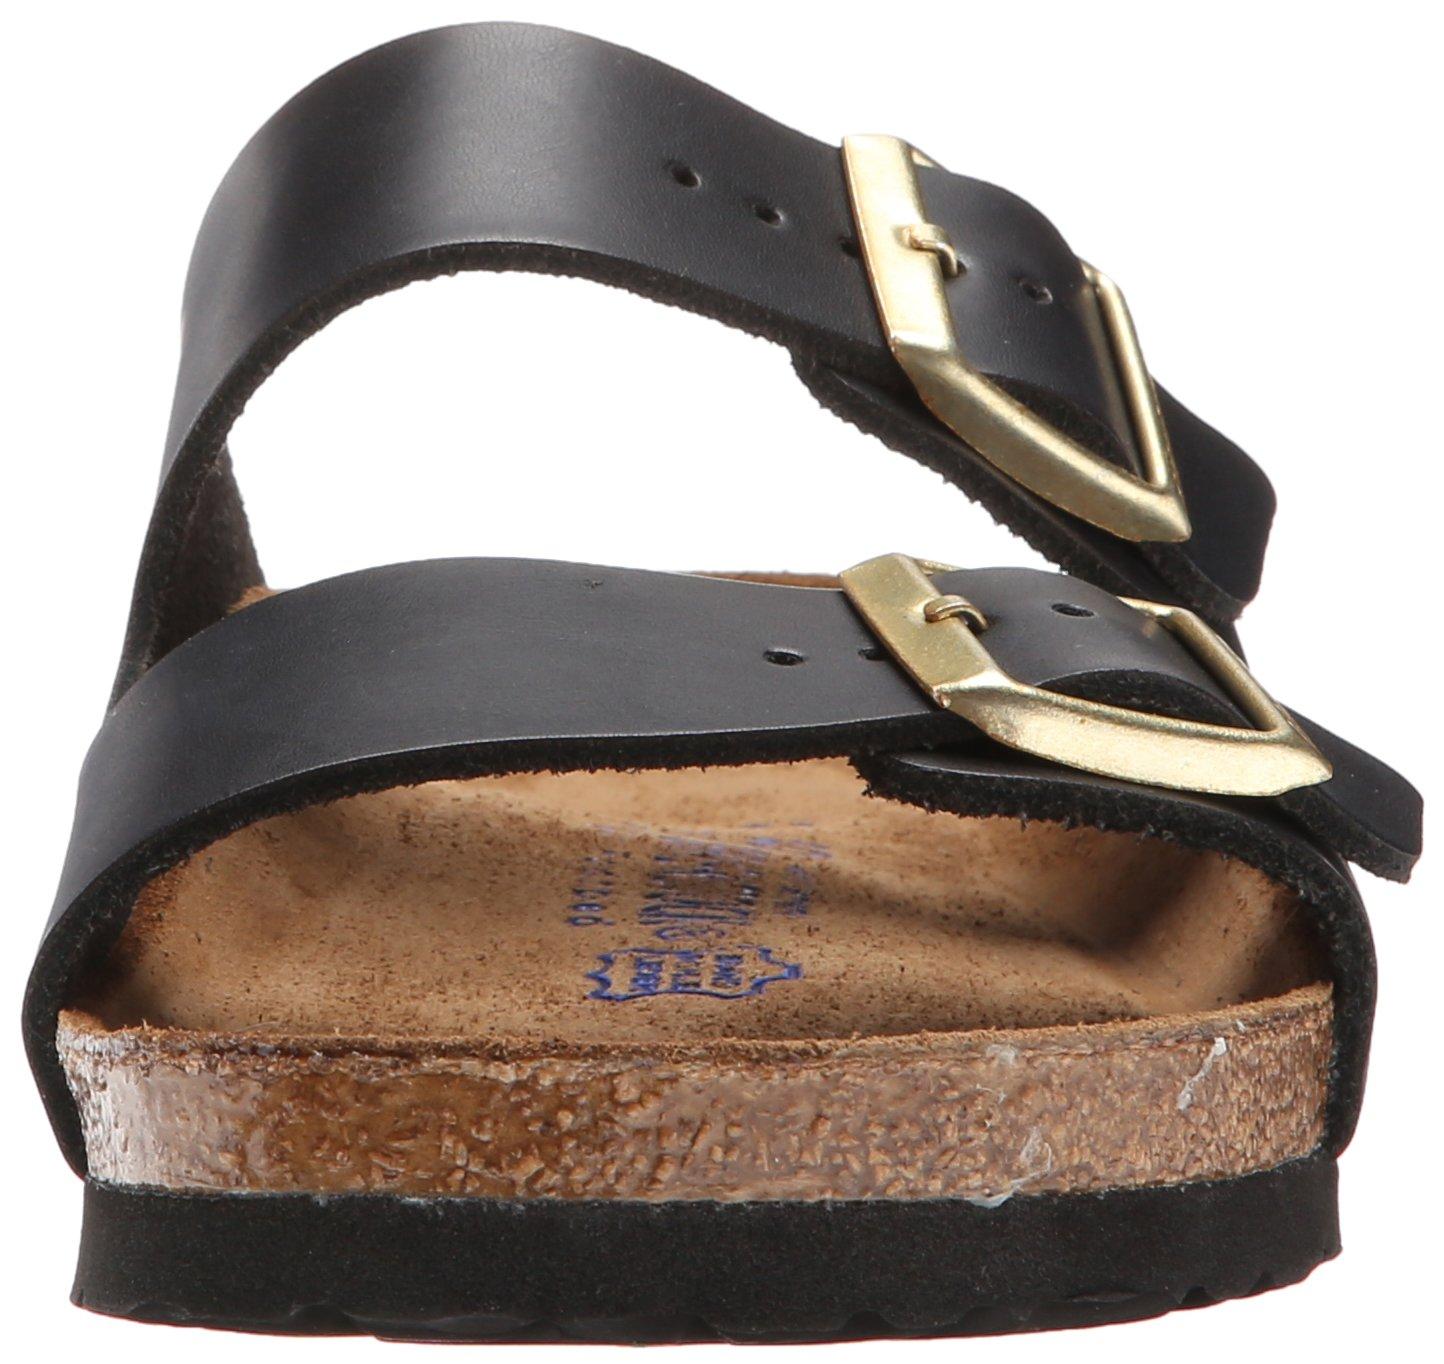 Birkenstock Unisex Arizona Hunter Black Leather Sandals - 9-9.5 2A(N) US Women/7-7.5 2A(N) US Men by Birkenstock (Image #4)